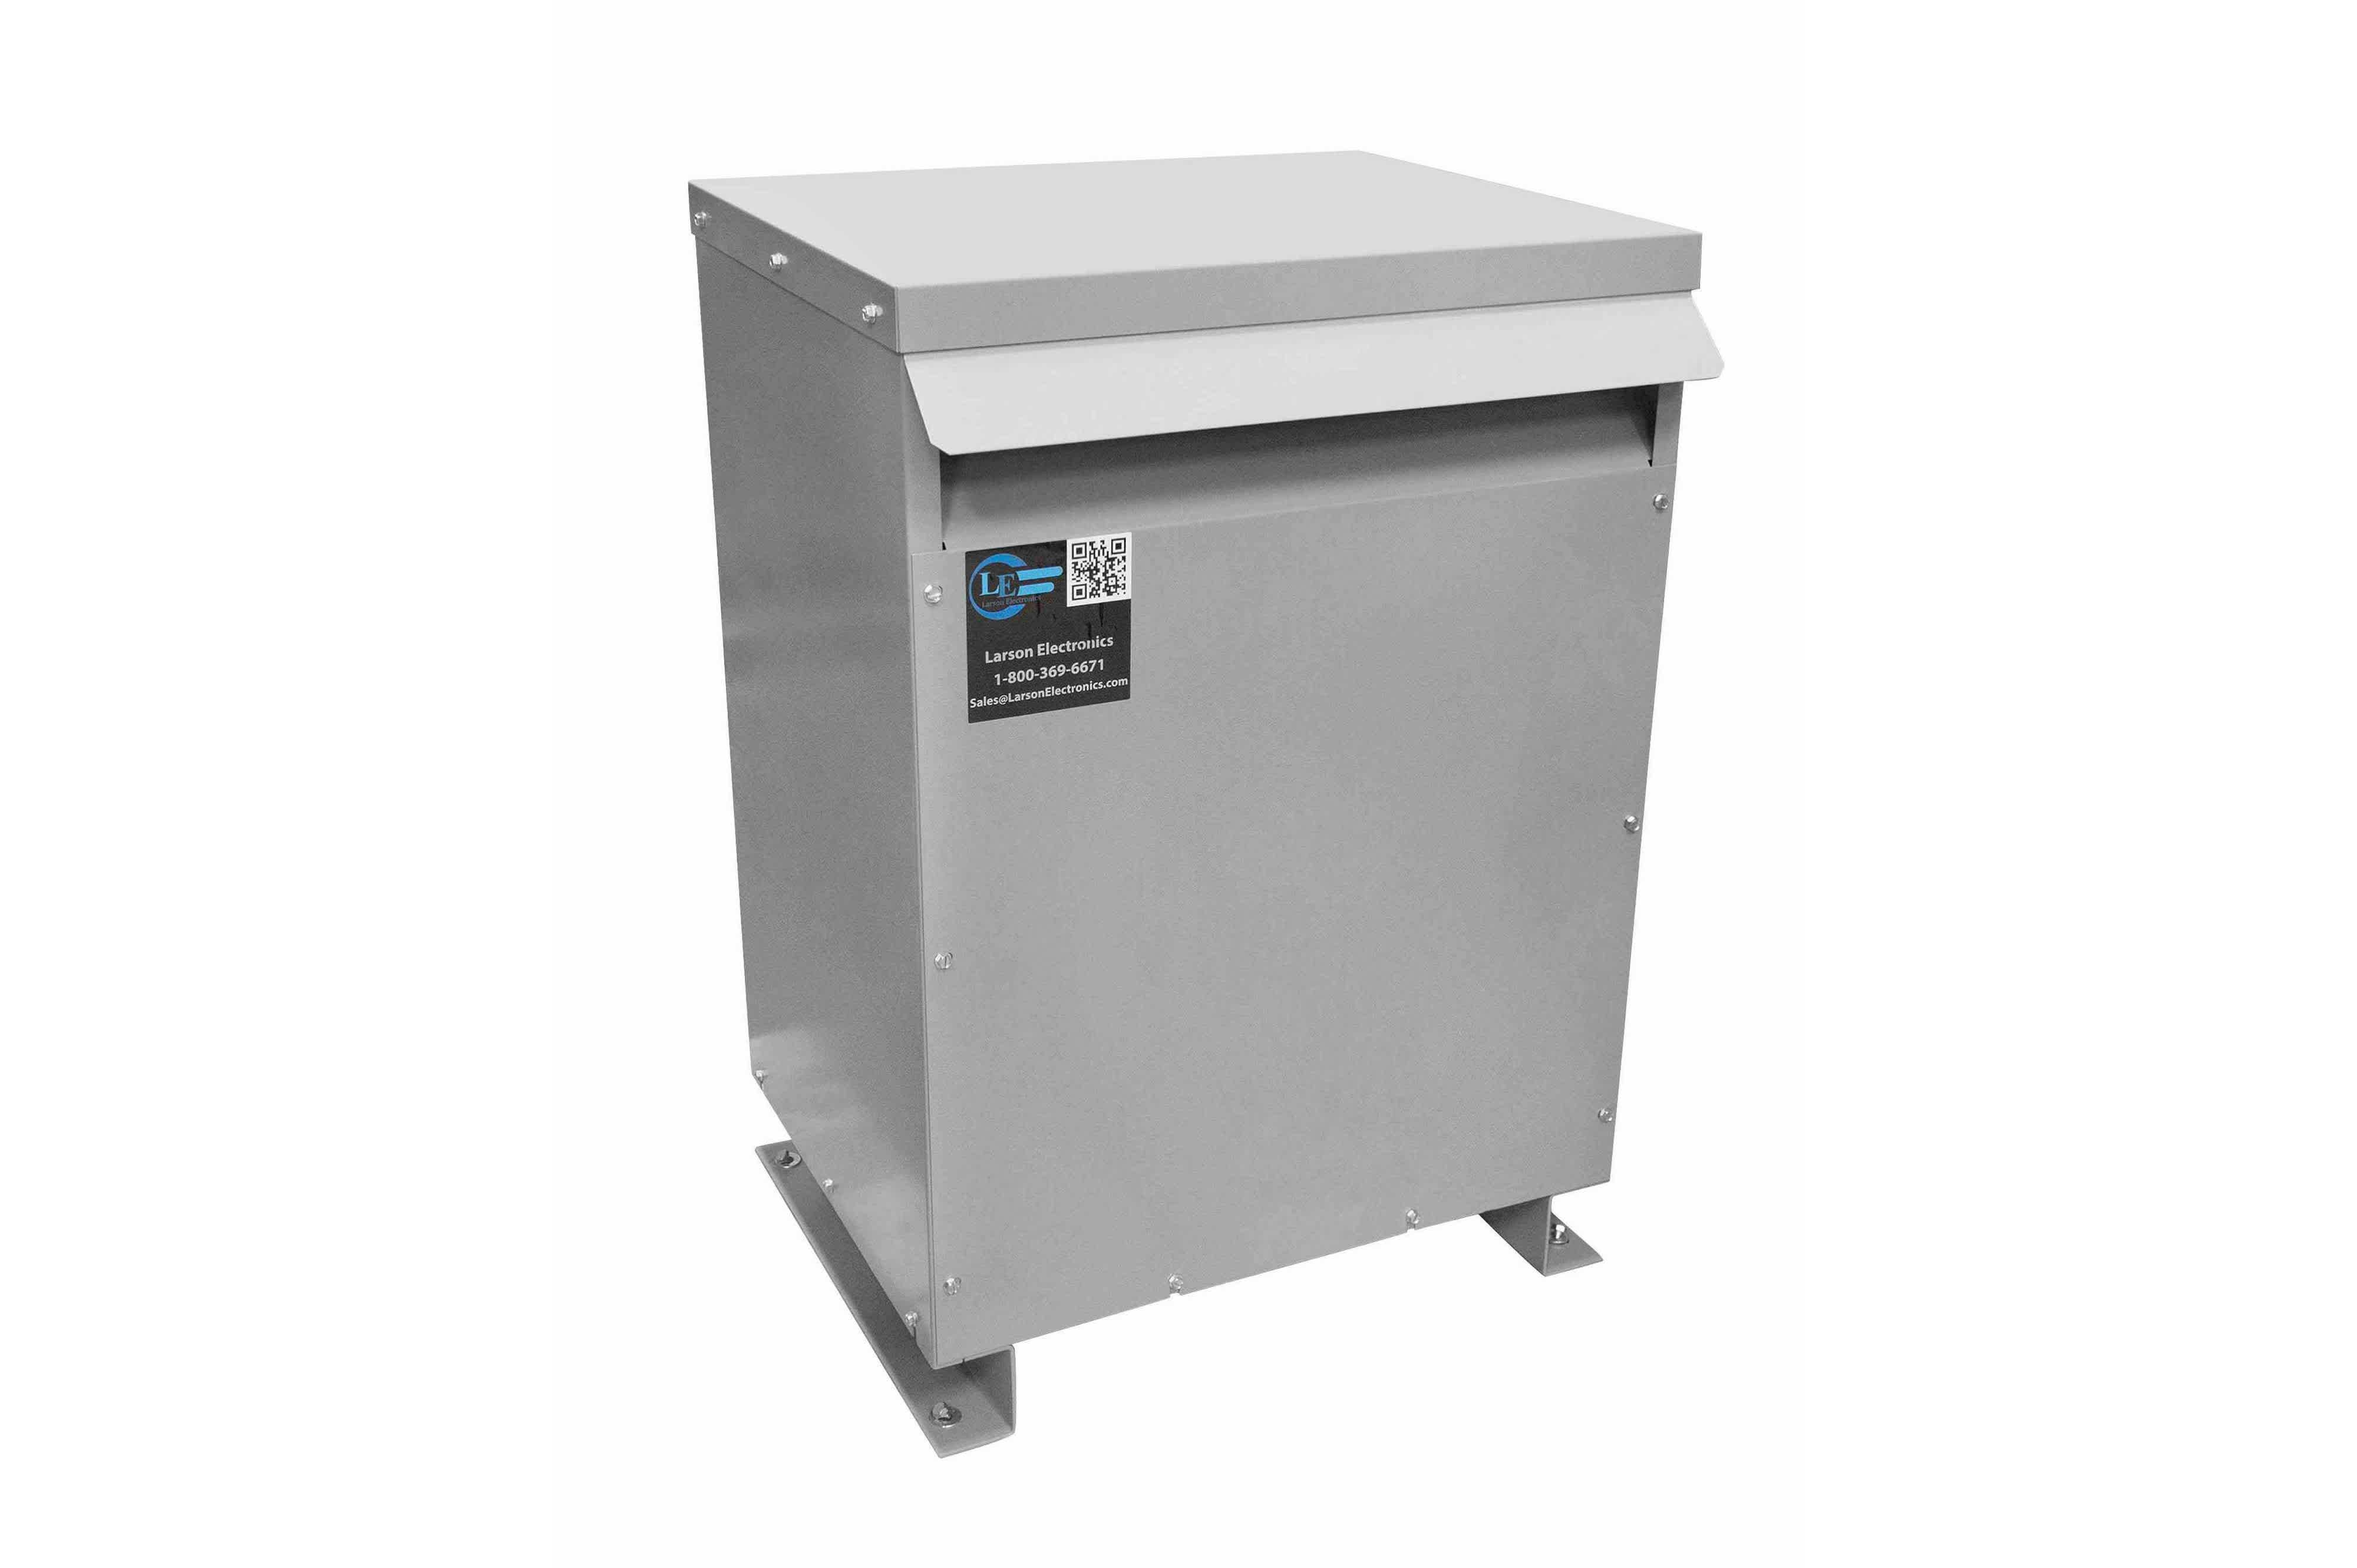 225 kVA 3PH Isolation Transformer, 460V Wye Primary, 600Y/347 Wye-N Secondary, N3R, Ventilated, 60 Hz